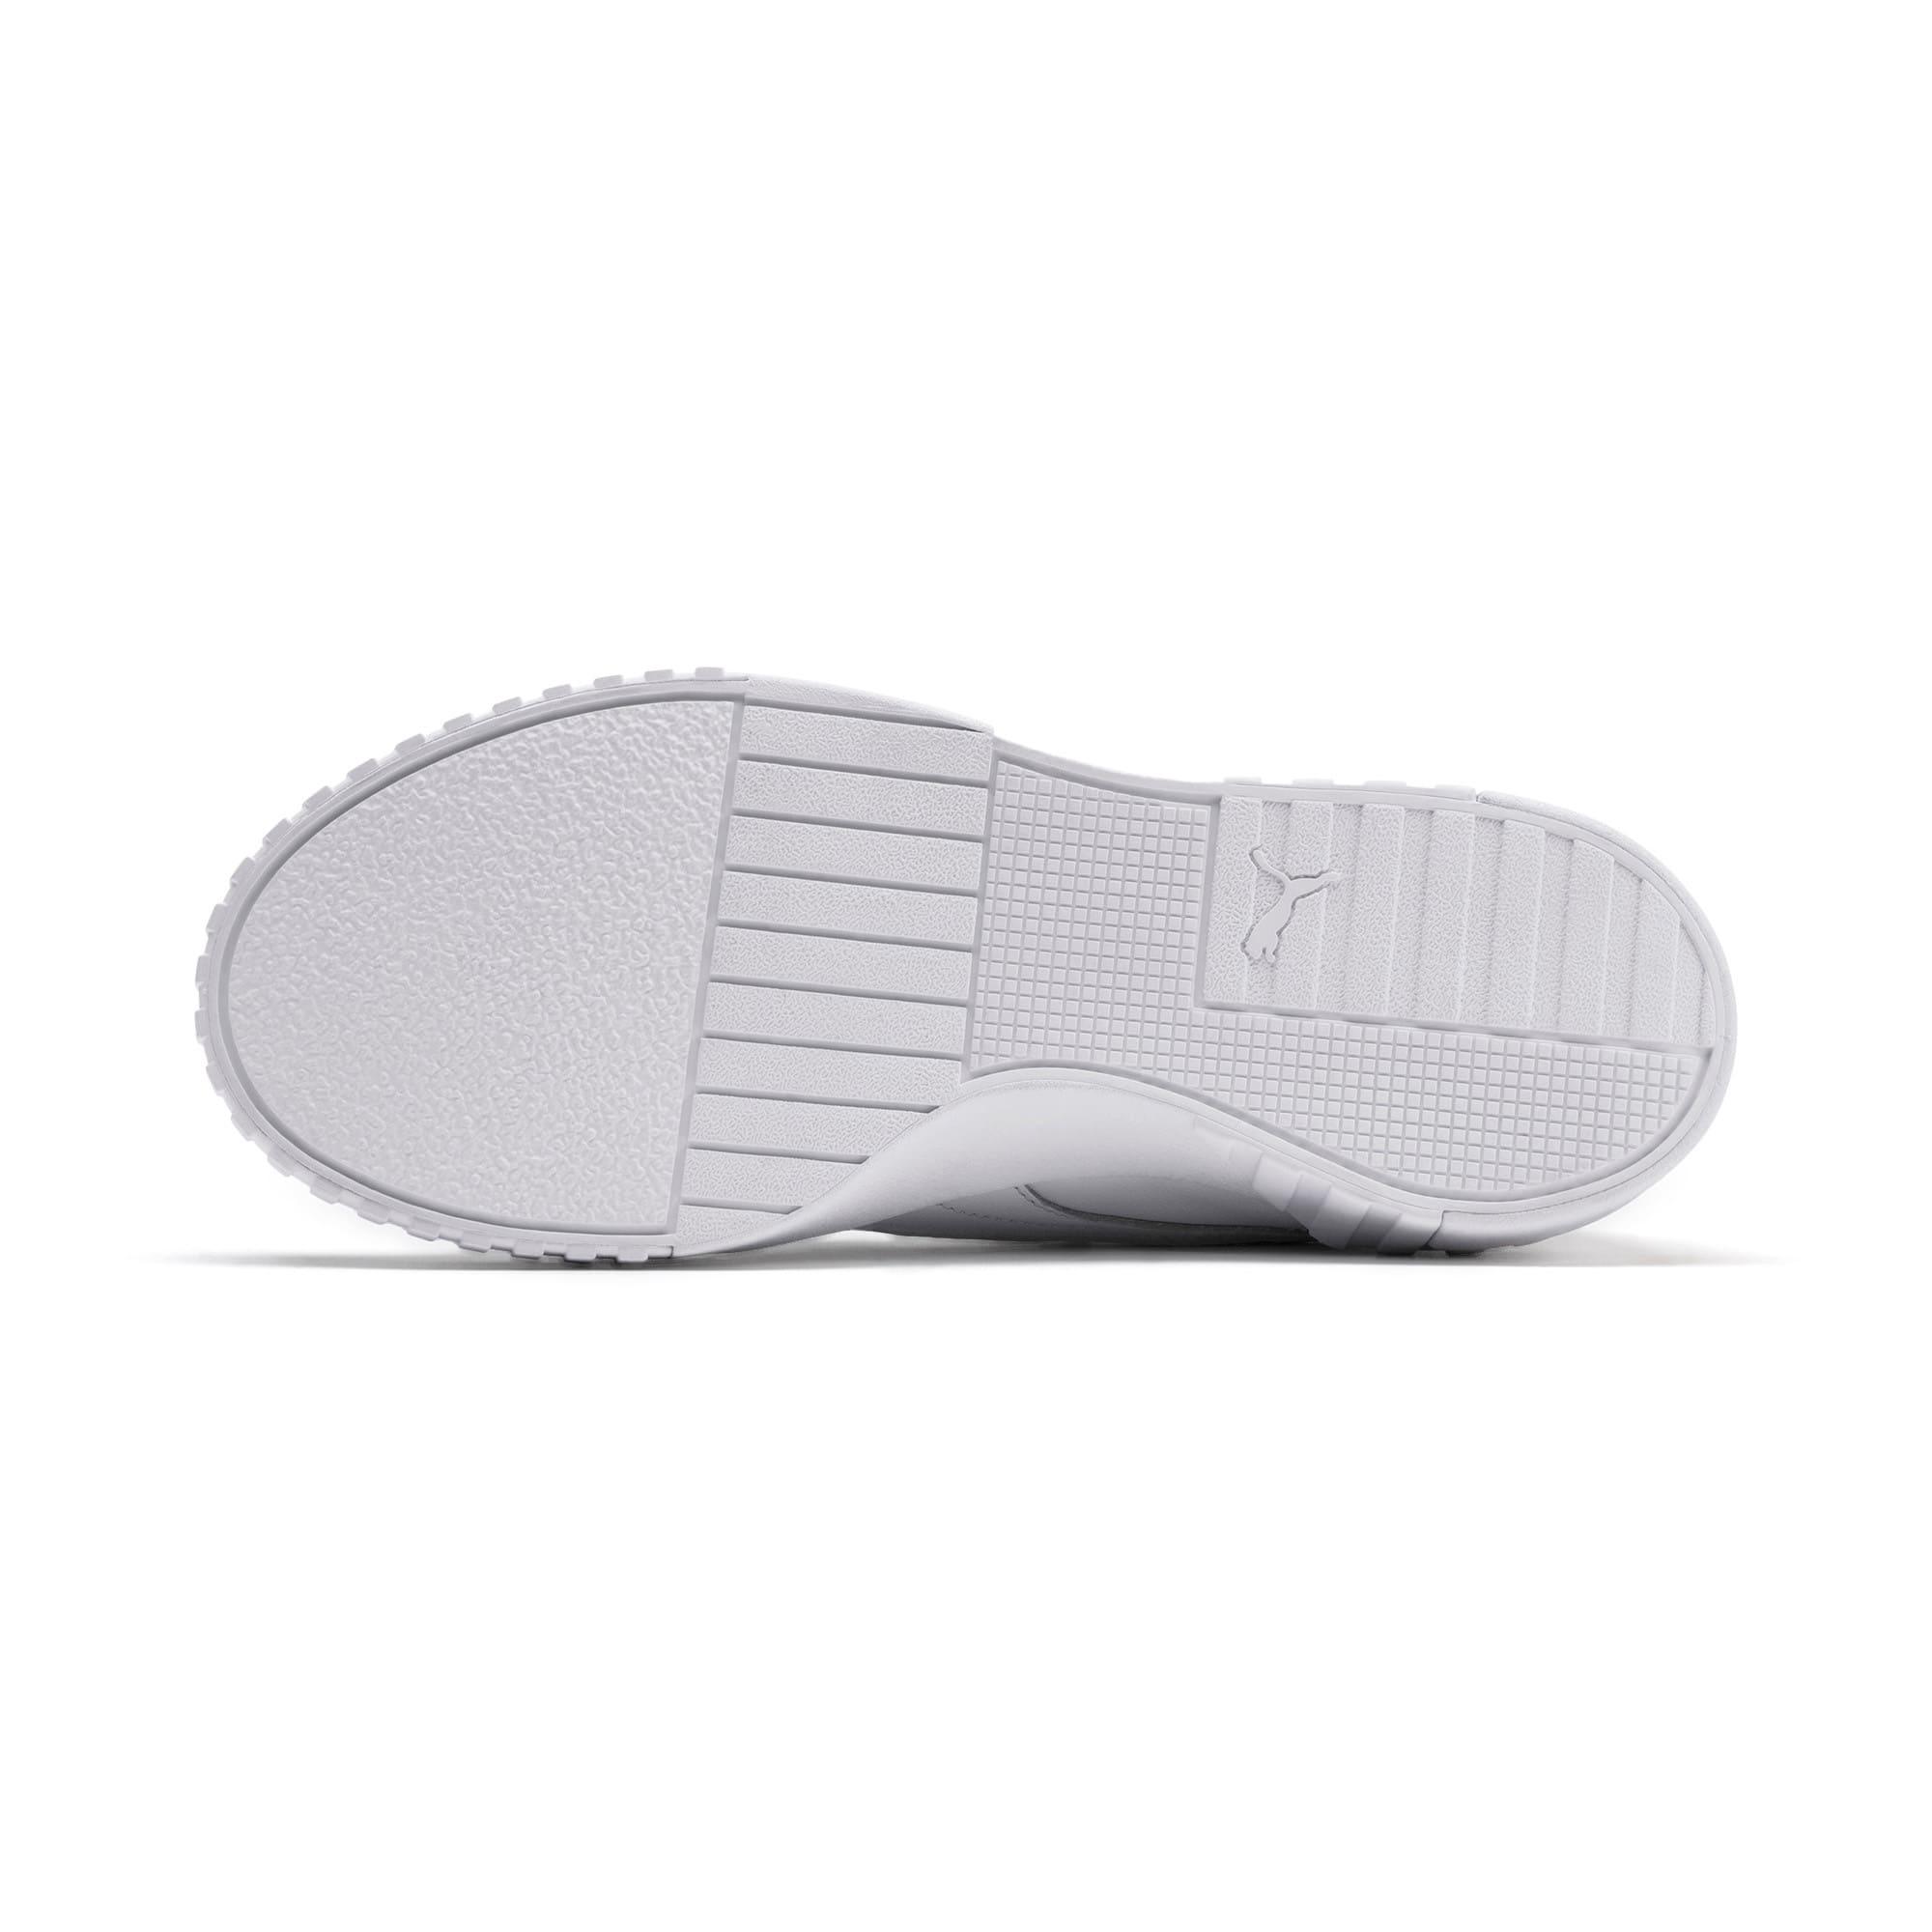 Thumbnail 5 of SG x Cali Women's Sneakers, Puma White-Puma White, medium